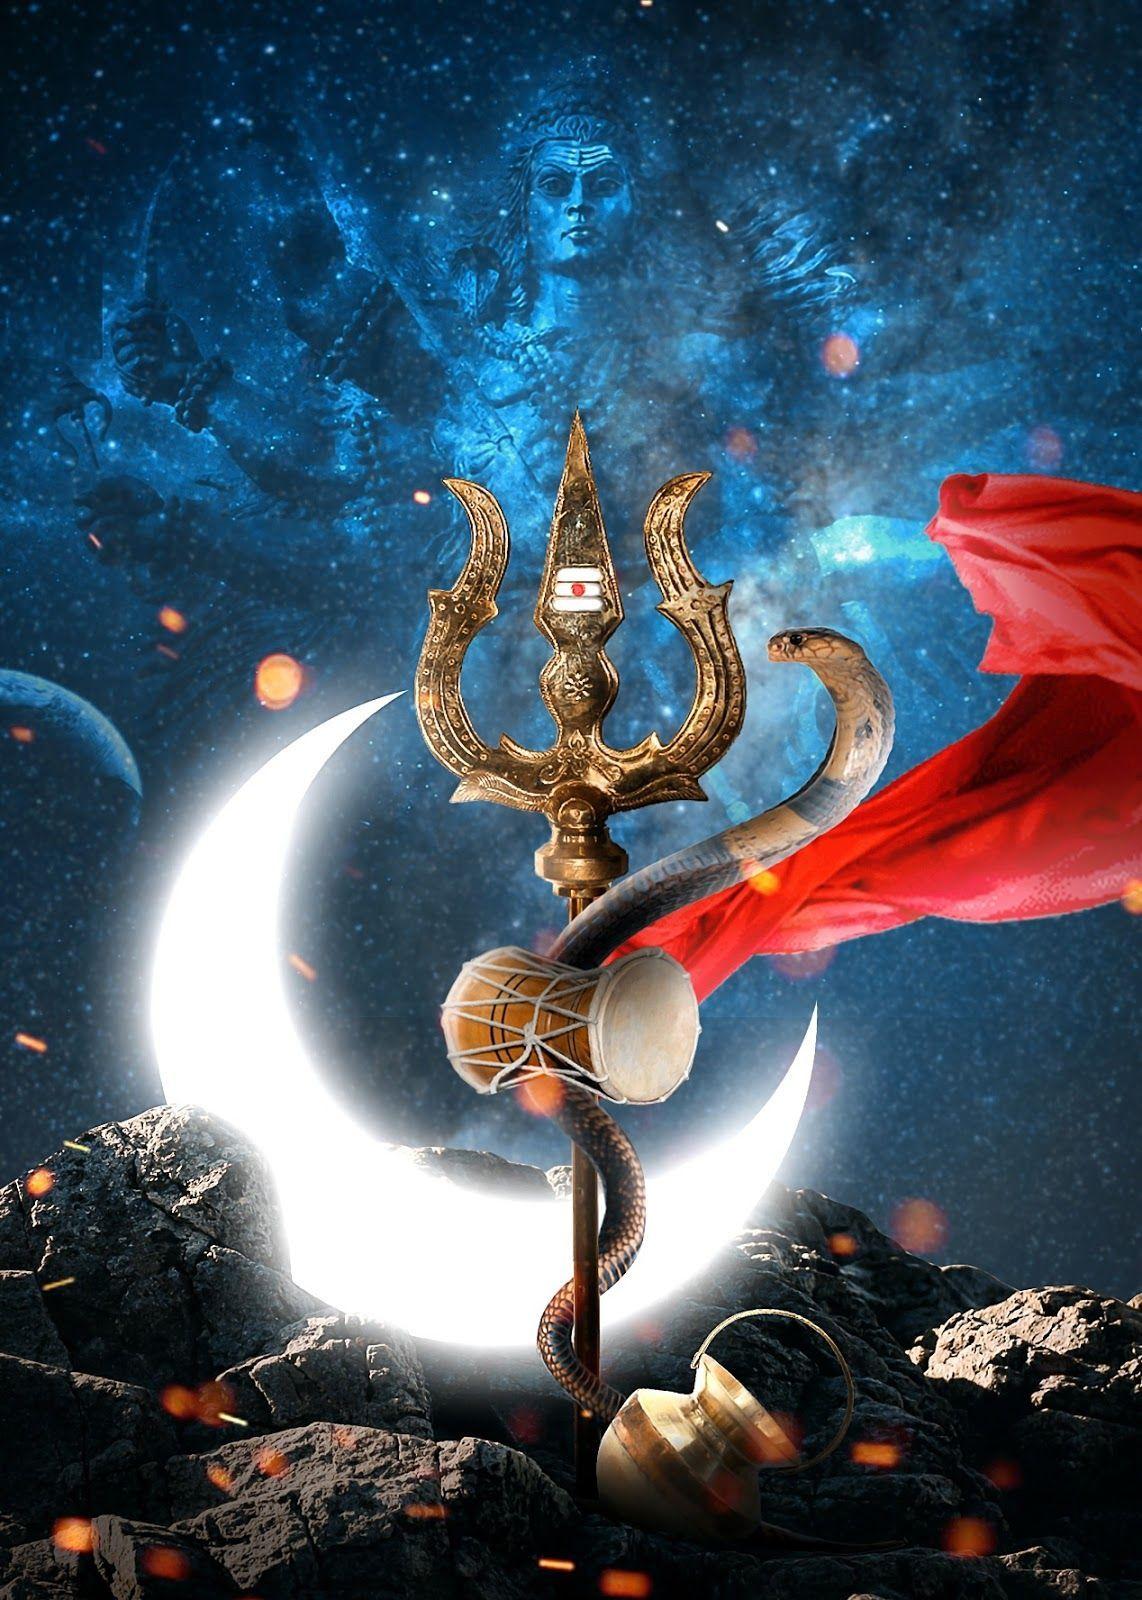 Mahadev Fond dcran mobile Lord Shiva   Fonds dcran HD mobile 1142x1600